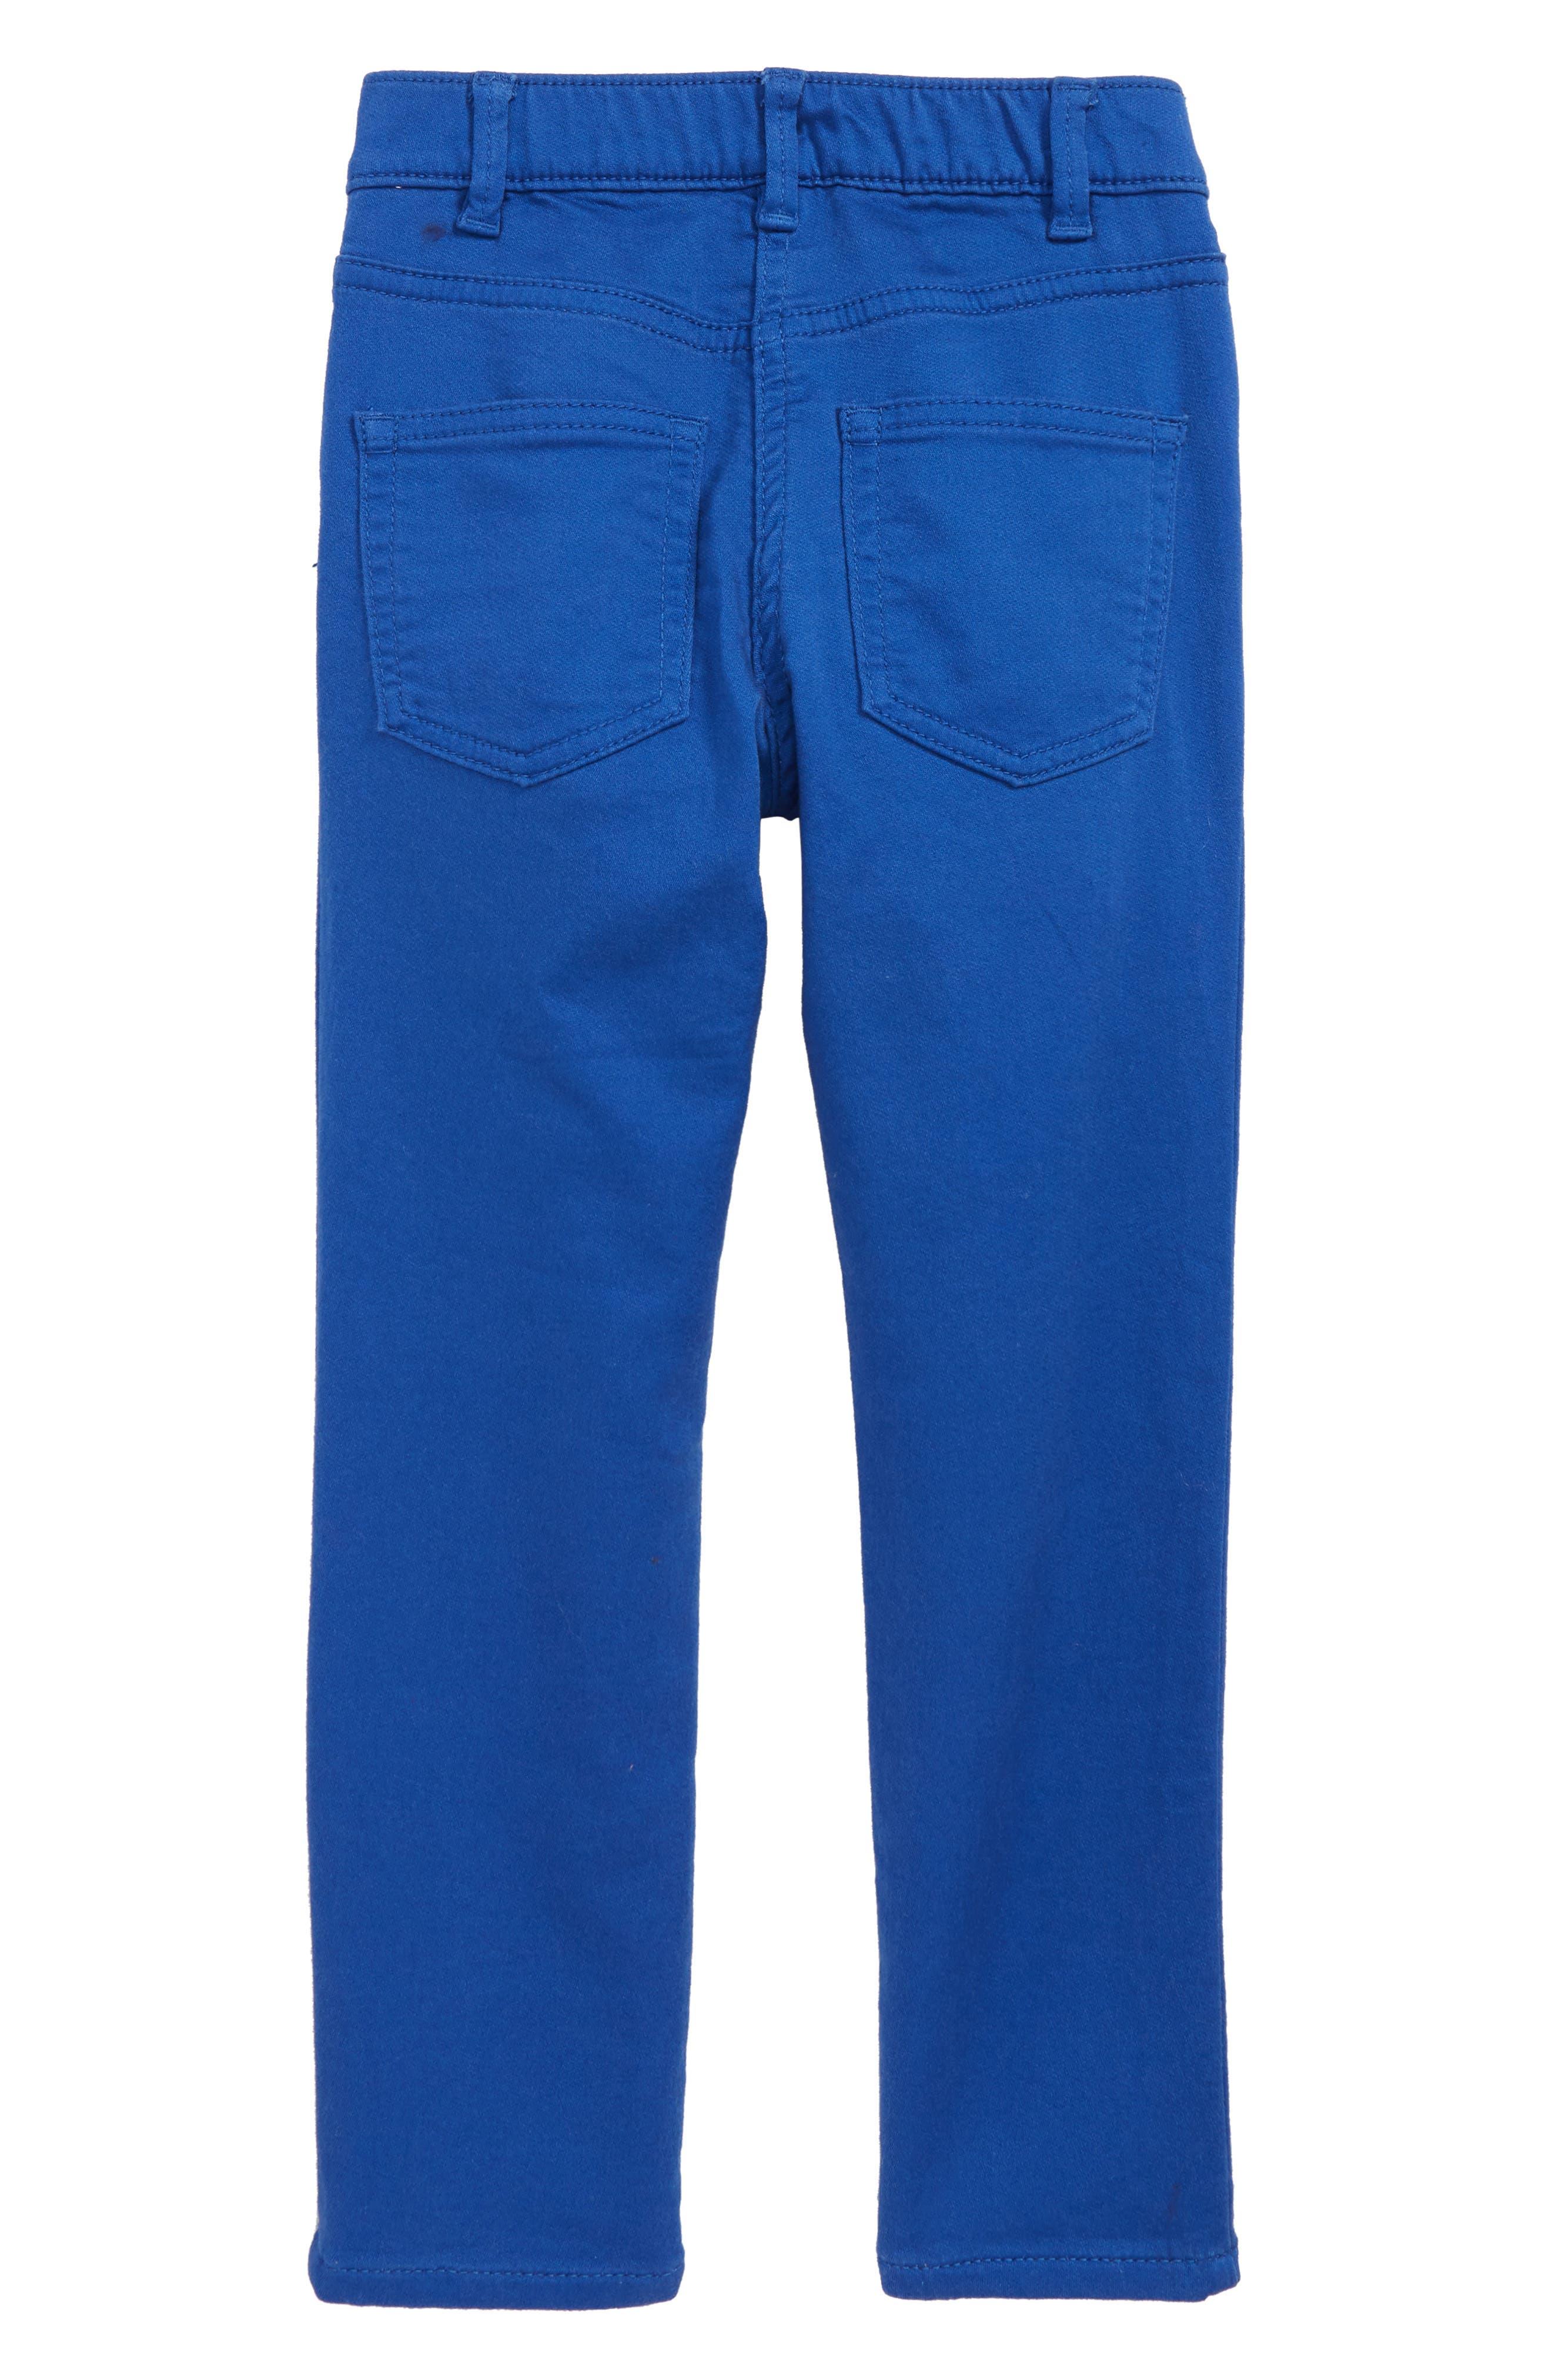 Runaround Garment Dye Jeans,                             Alternate thumbnail 2, color,                             LAGOON BLUE